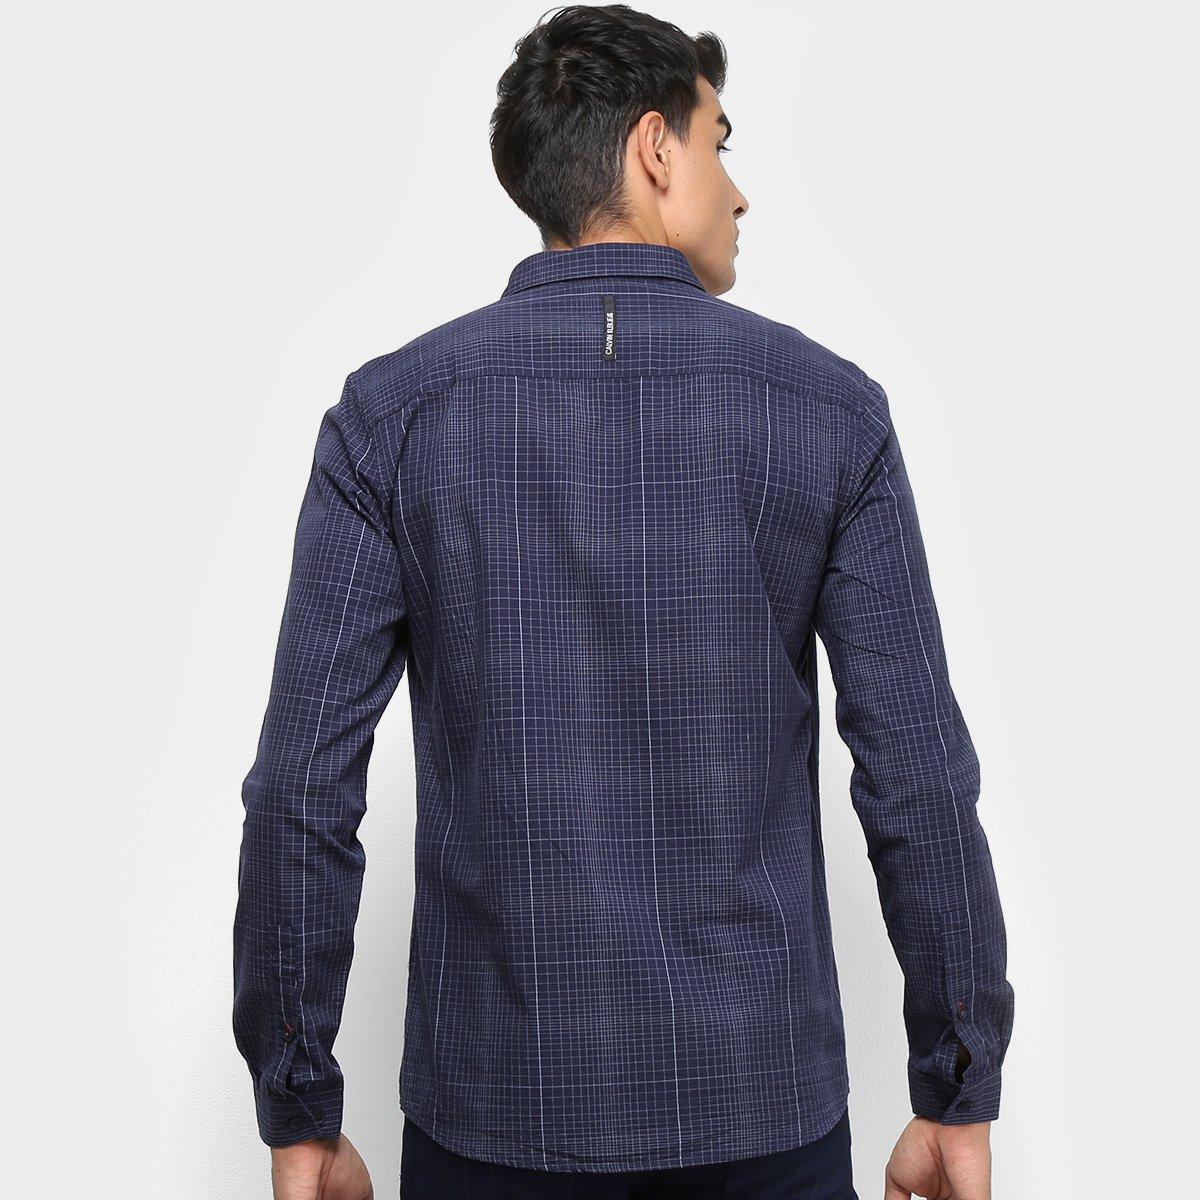 cfa15f26704eee Camisa Xadrez Manga Longa Calvin Klein Silk Masculina - Tam: G ...